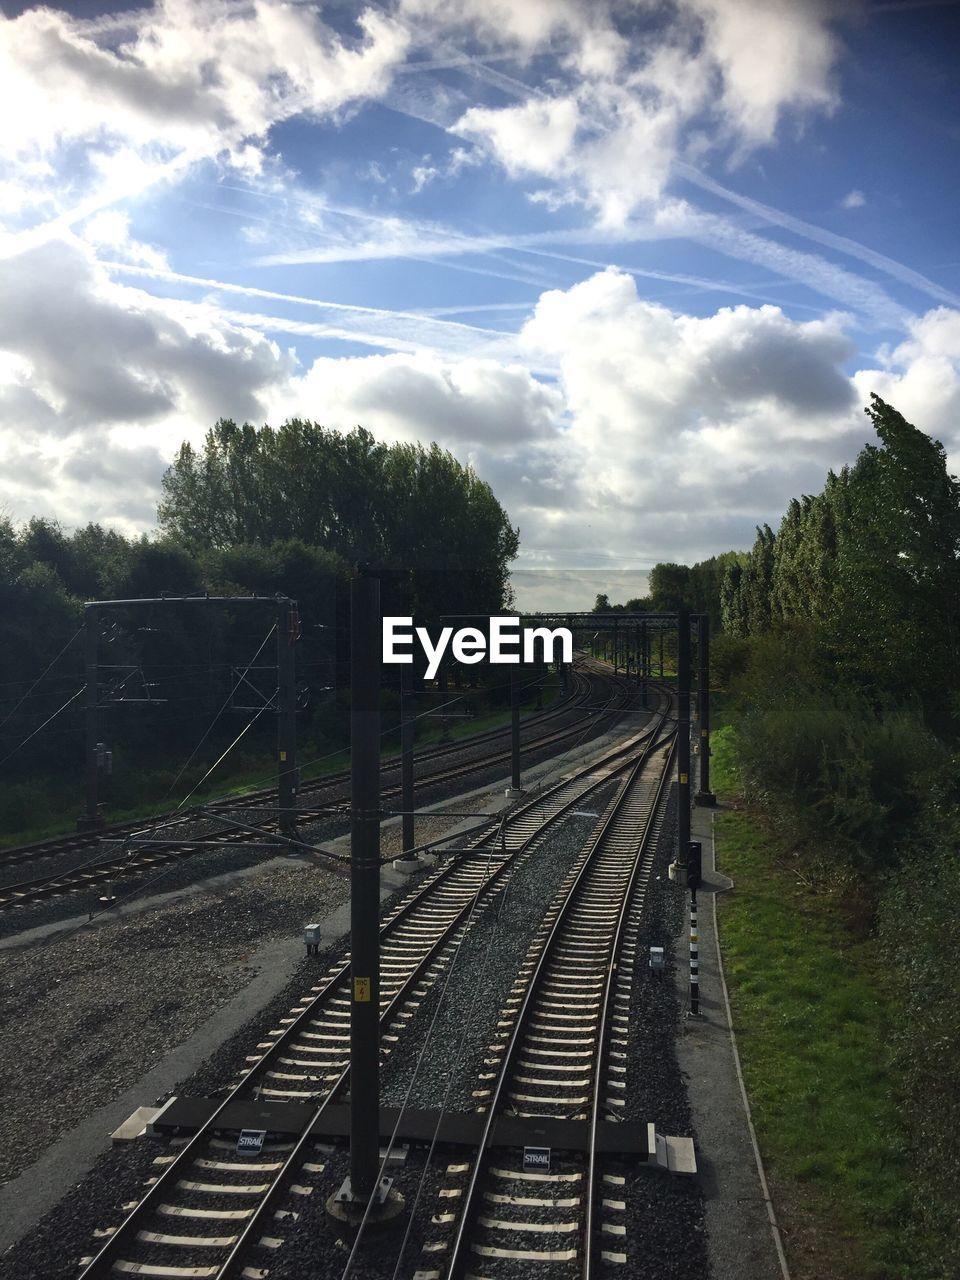 railroad track, transportation, rail transportation, sky, cloud - sky, the way forward, day, no people, railway track, train - vehicle, tree, public transportation, nature, outdoors